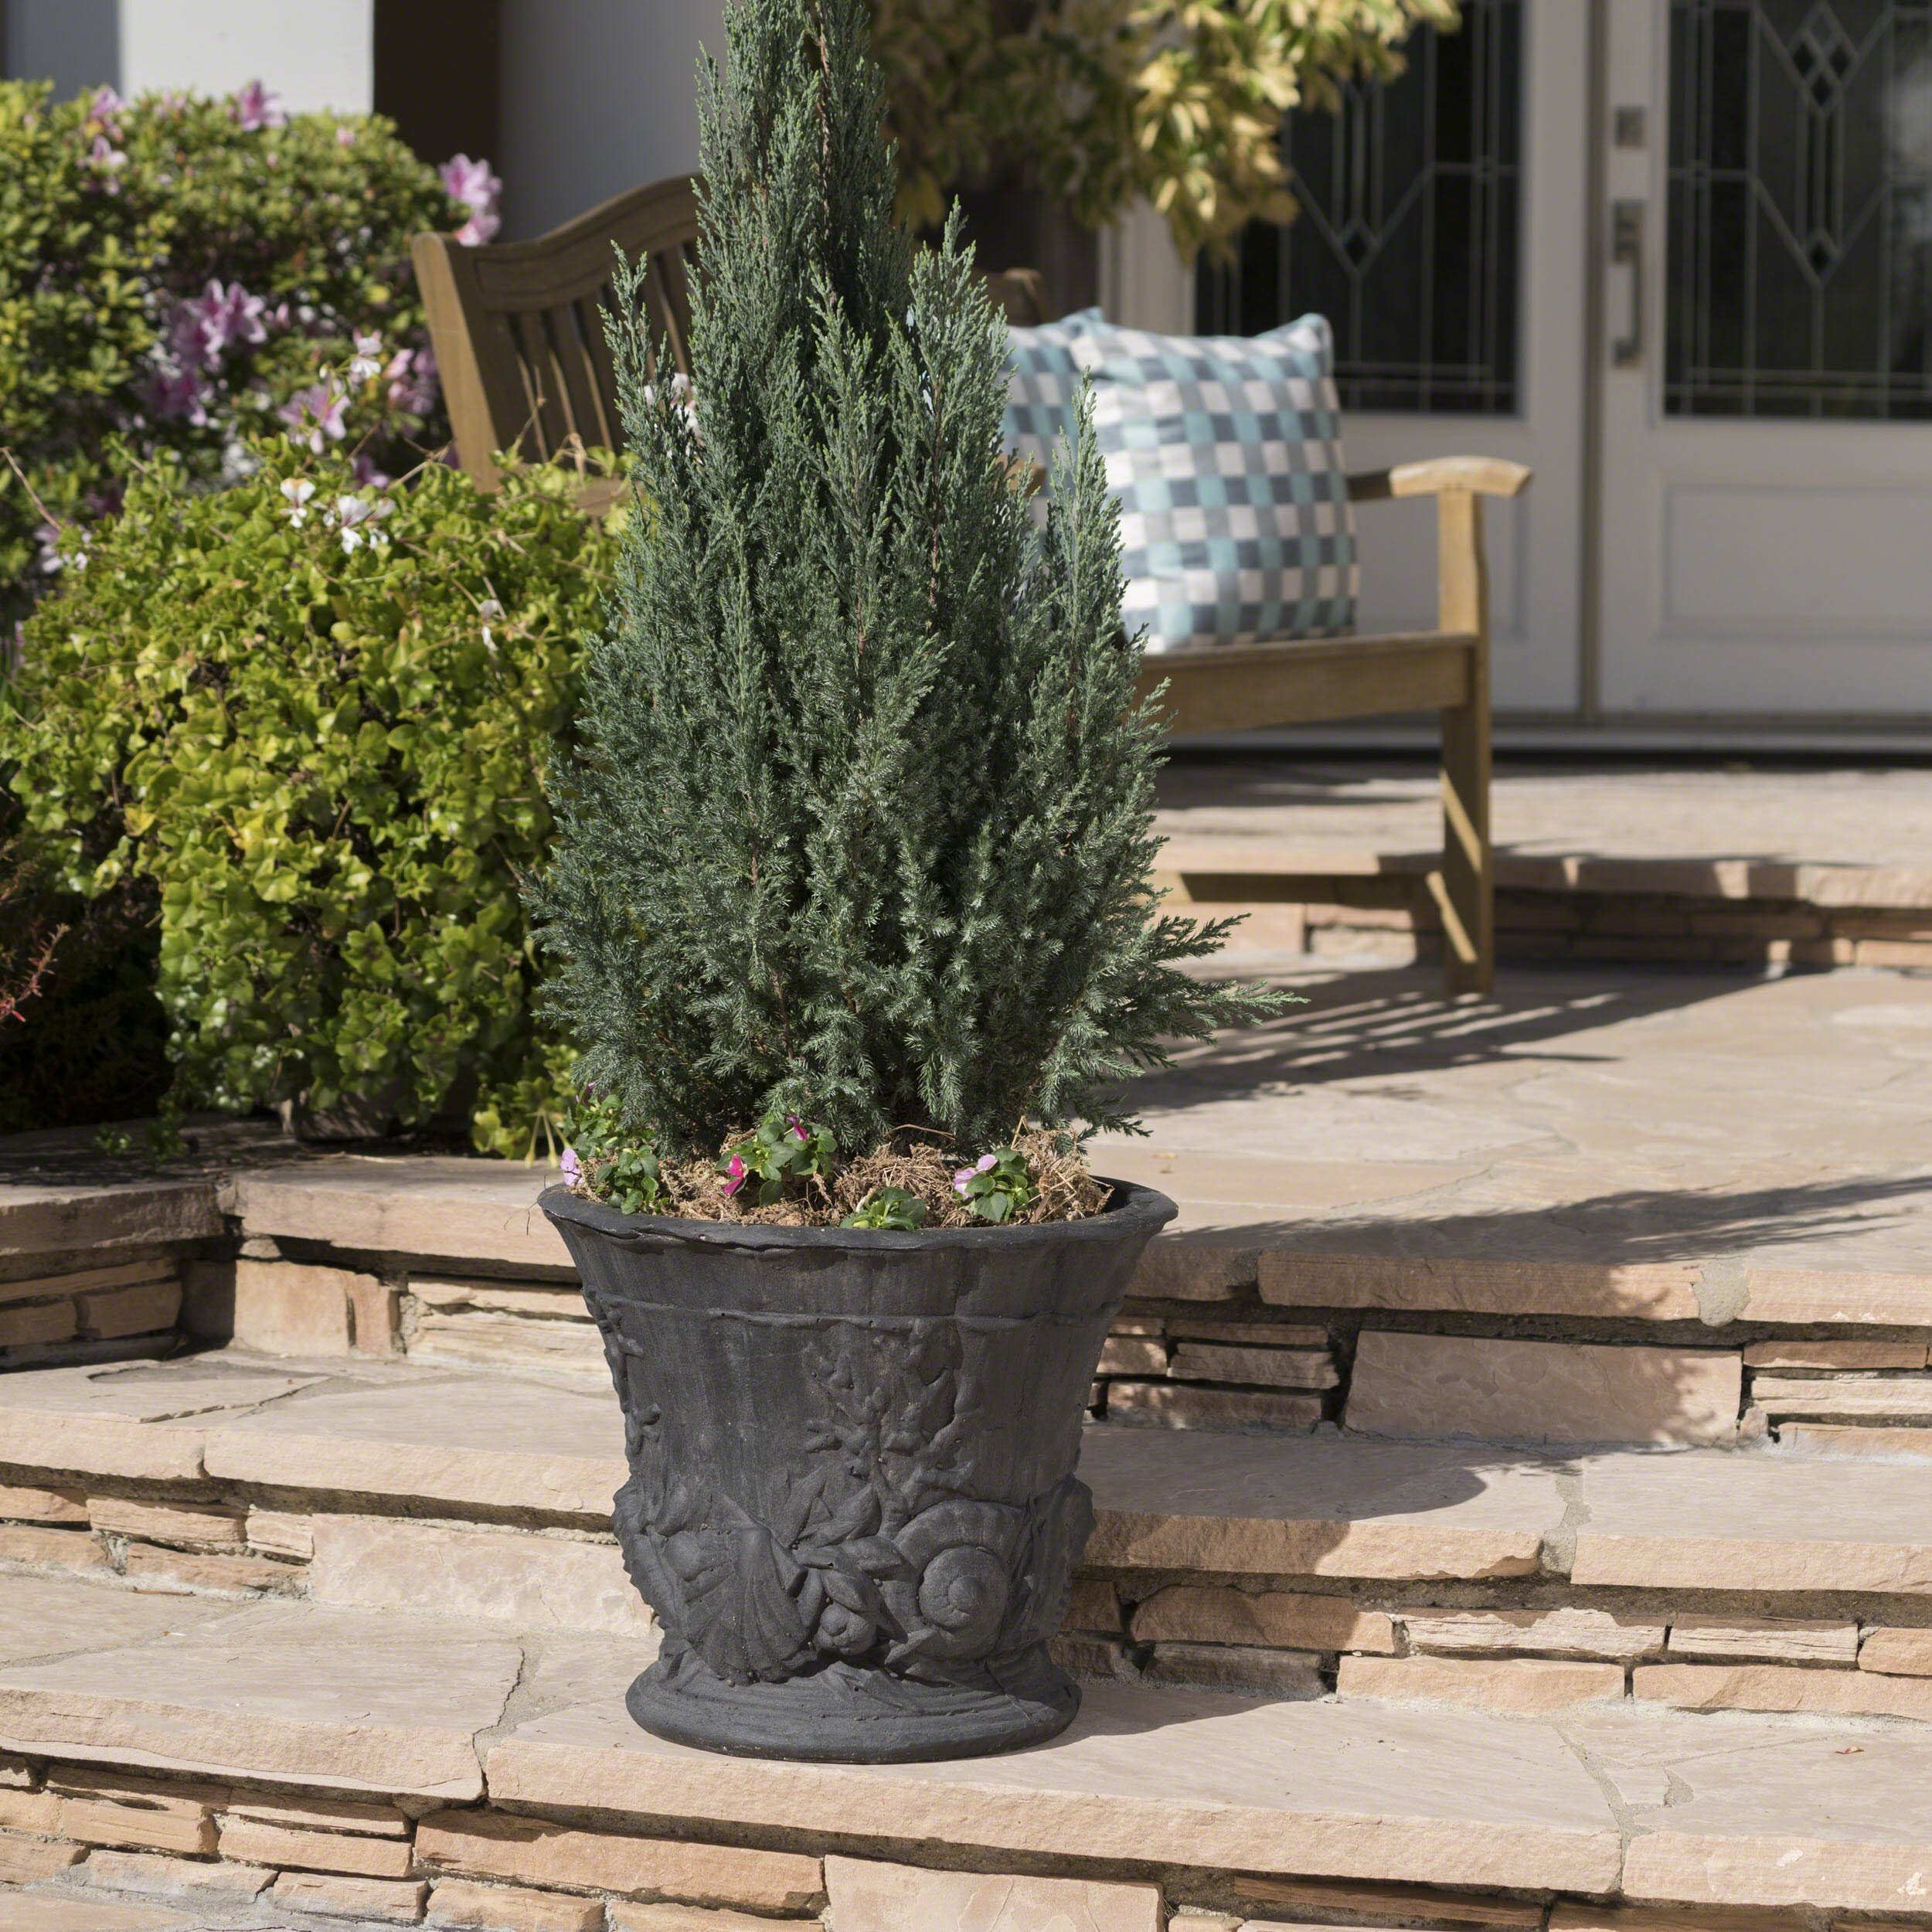 Great Deal Furniture Fern Outdoor Antique Black Finish Light Weight Concrete Urn